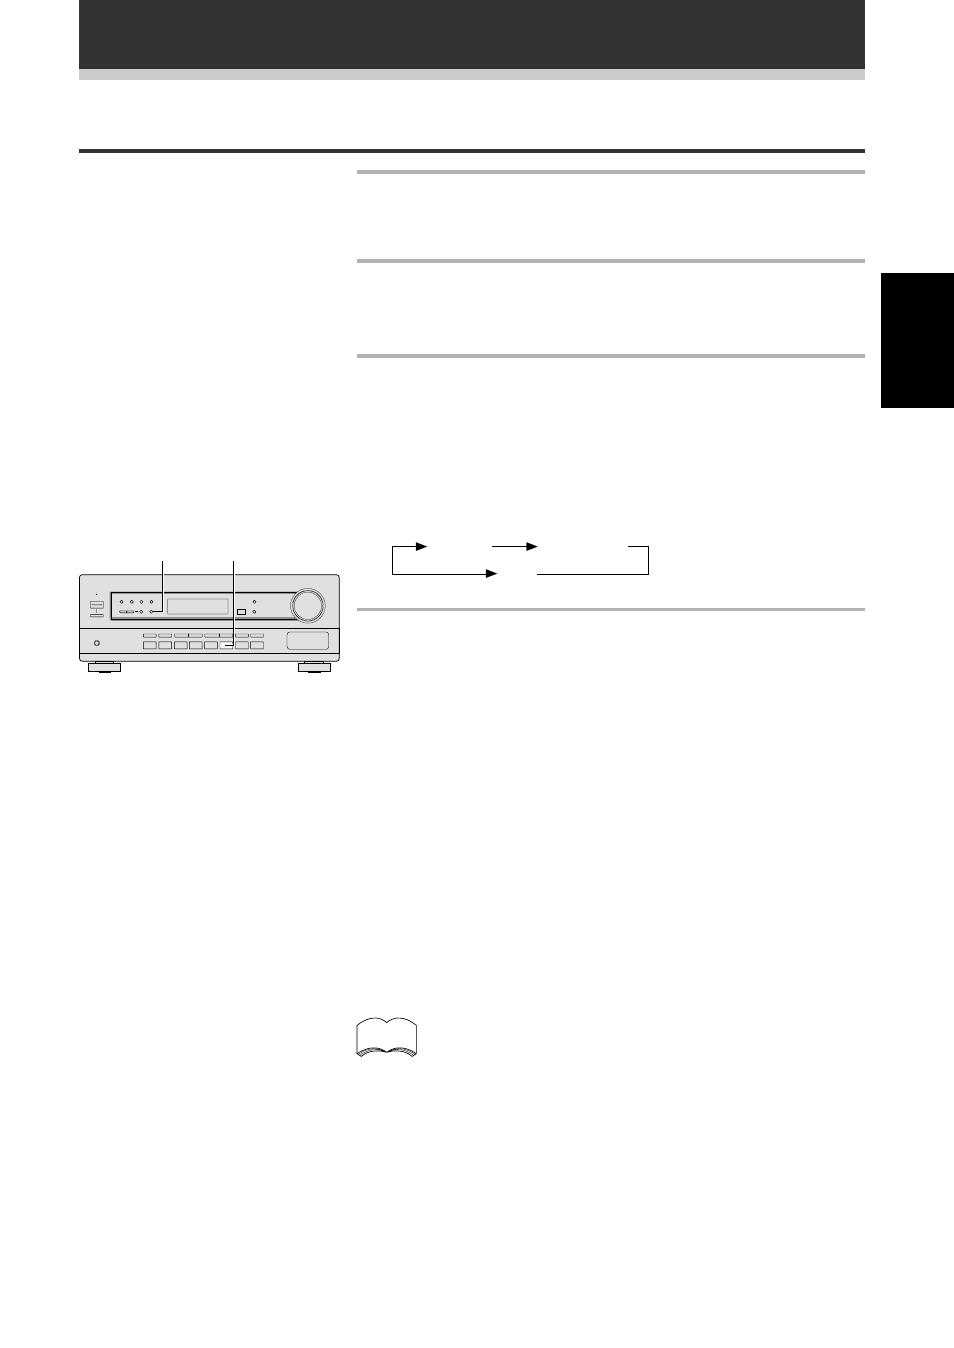 Eononepro portable column speaker user manual eon-one-userguide.